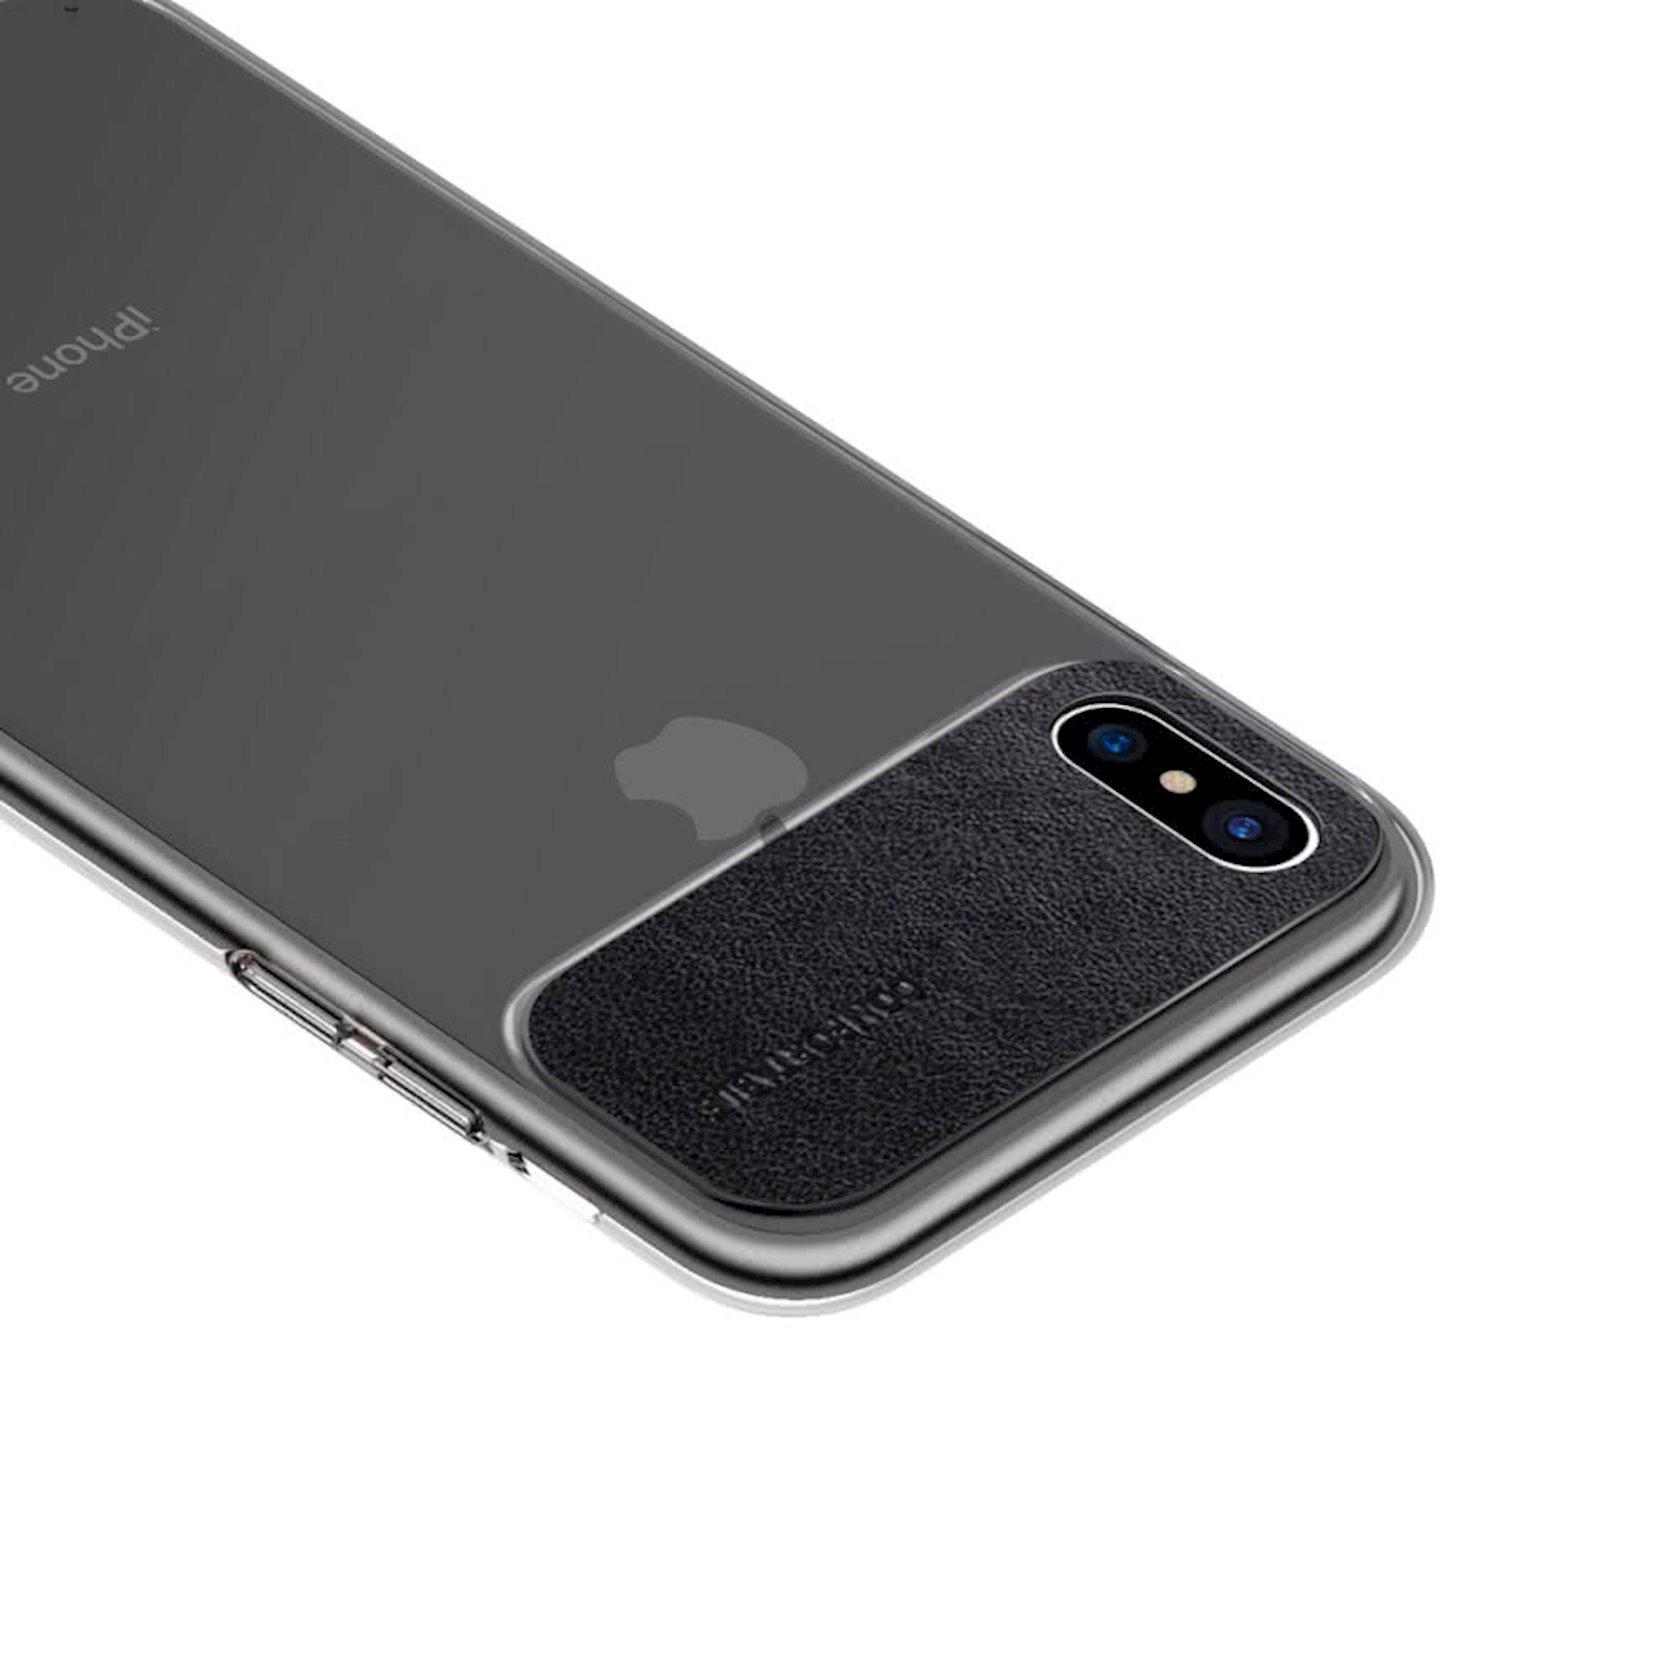 Çexol smartfon üçün Baseus Comfortable Series Apple iPhone Black X/XS